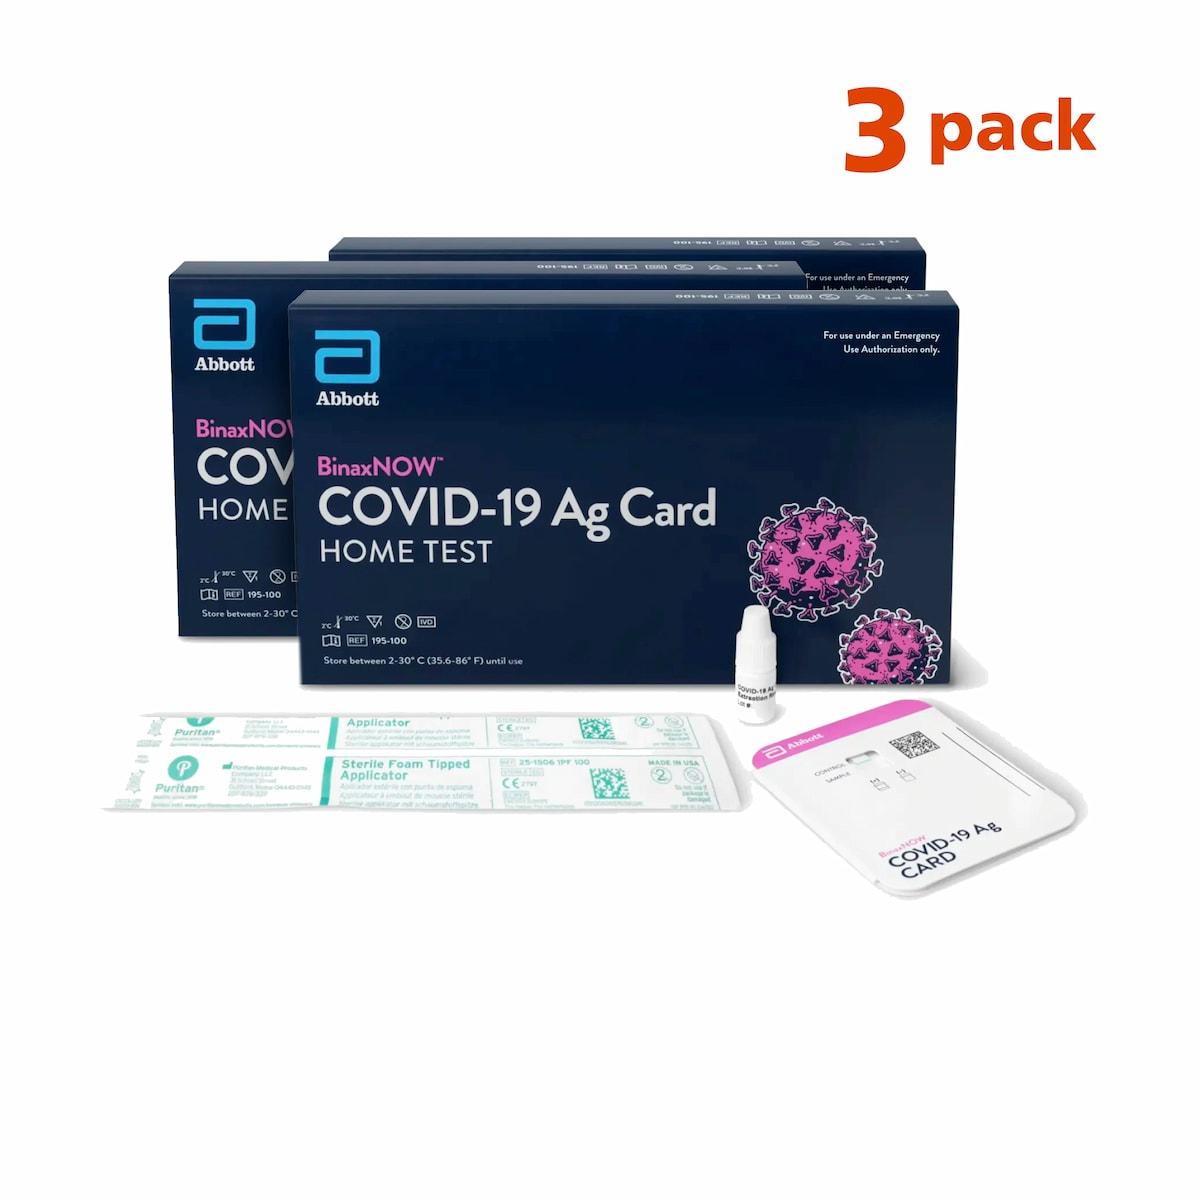 COVID-19 Test - Abbott's BinaxNOW™ Ag At-Home Kit 3 Pack